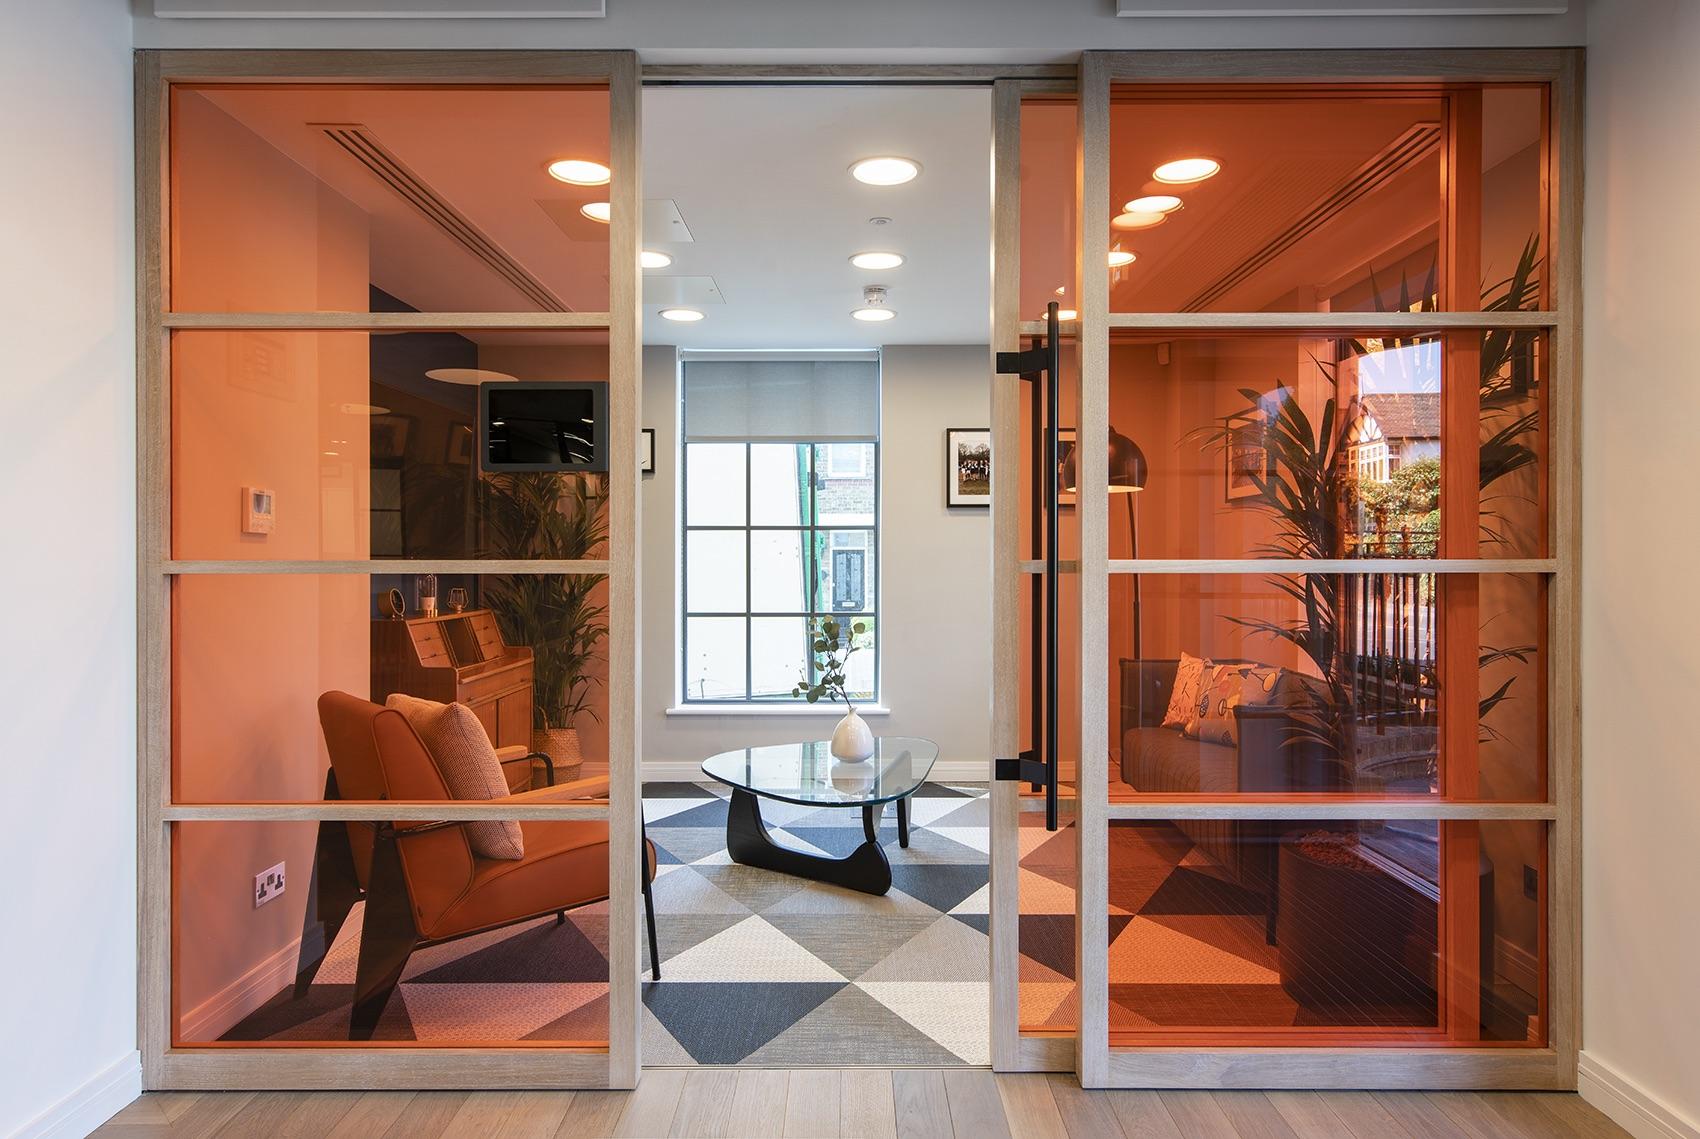 peldon-rose-new-office-london-6